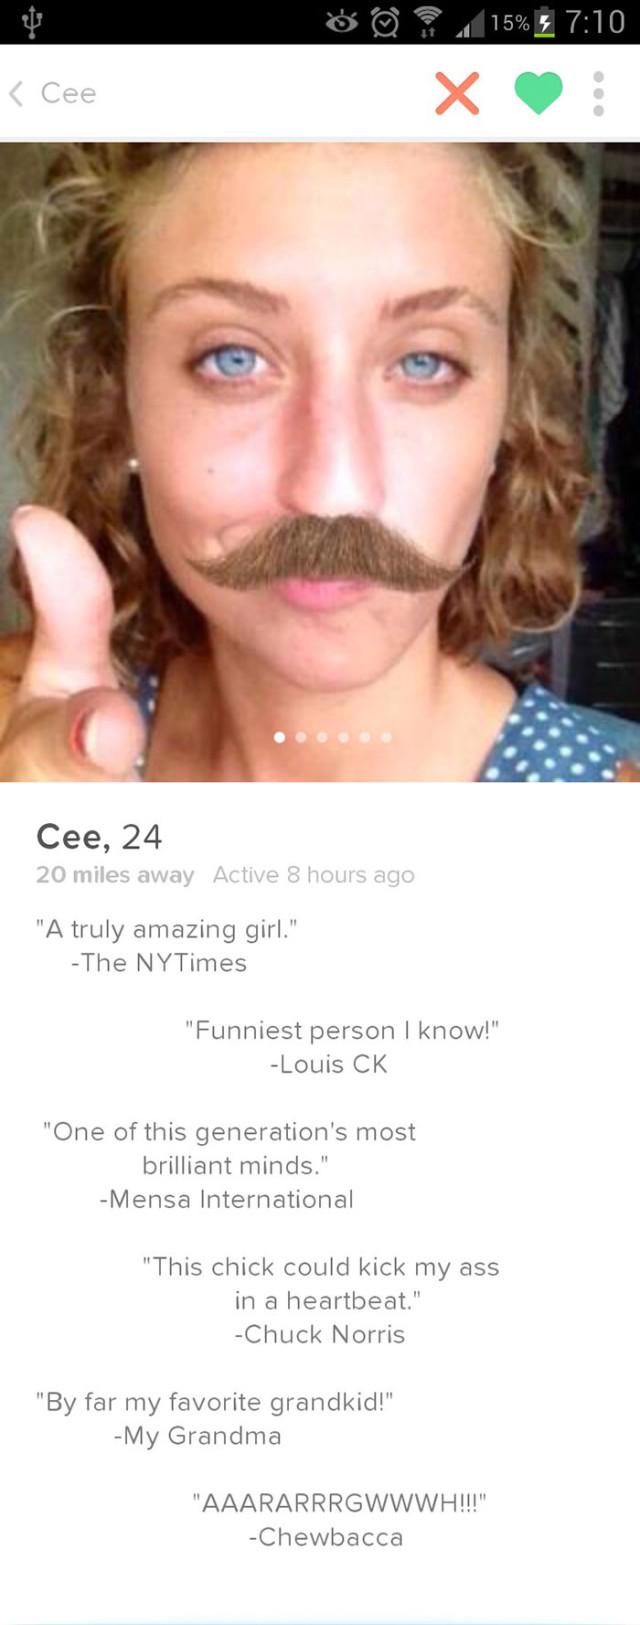 Profils Tinder bizarres : image 2